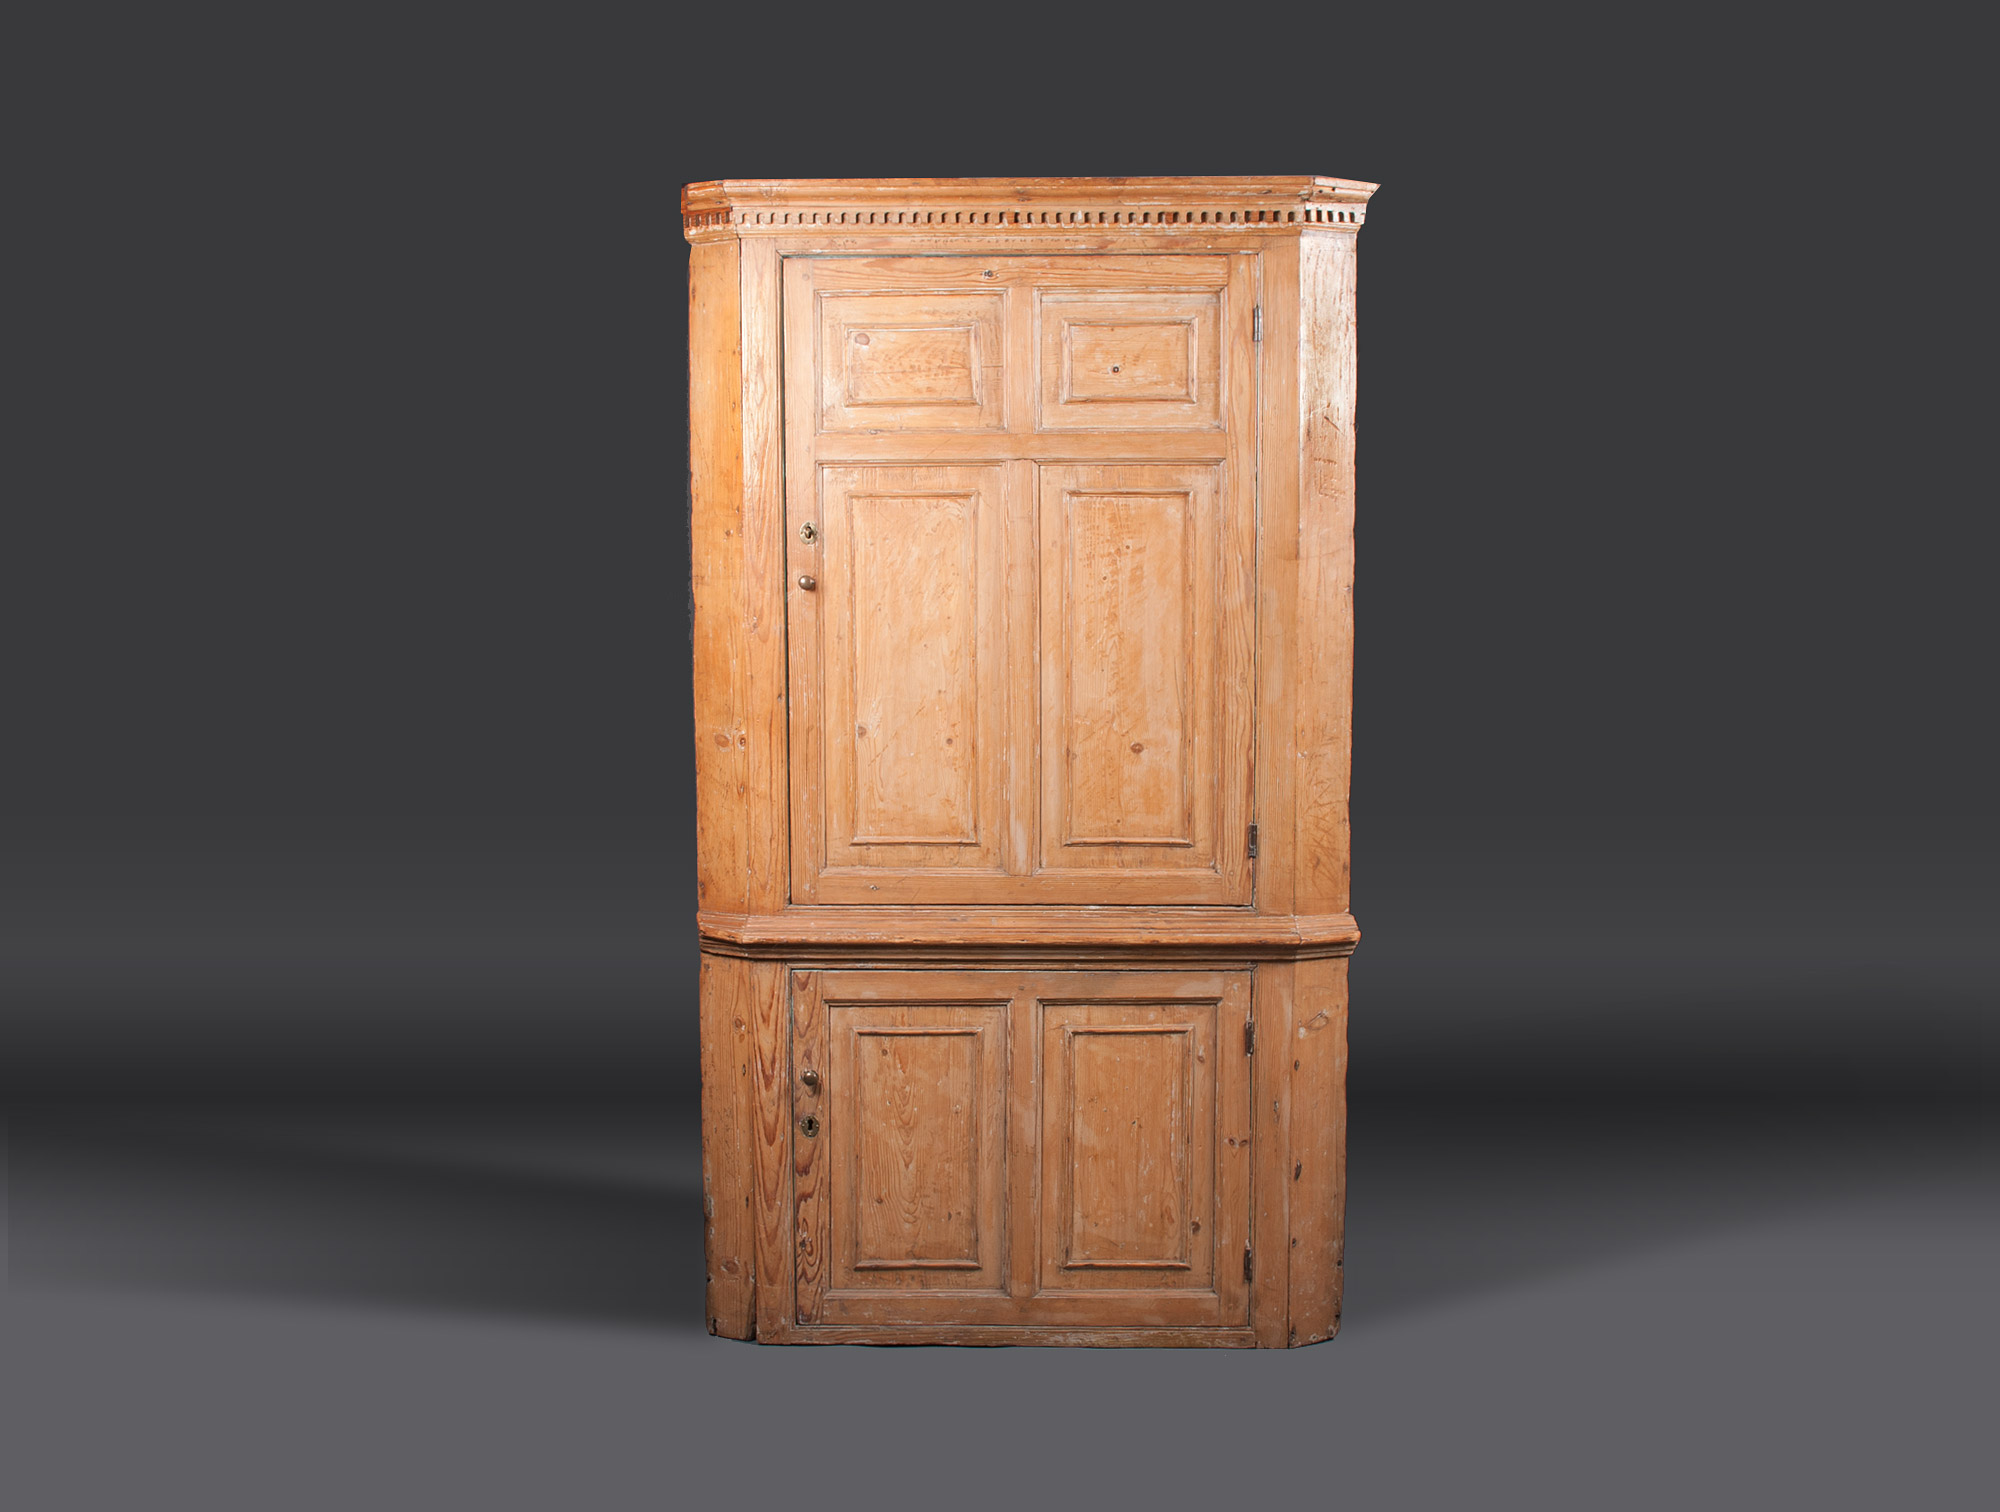 encoignure anglaise xviiie soubrier louer rangements buffet xviiie. Black Bedroom Furniture Sets. Home Design Ideas